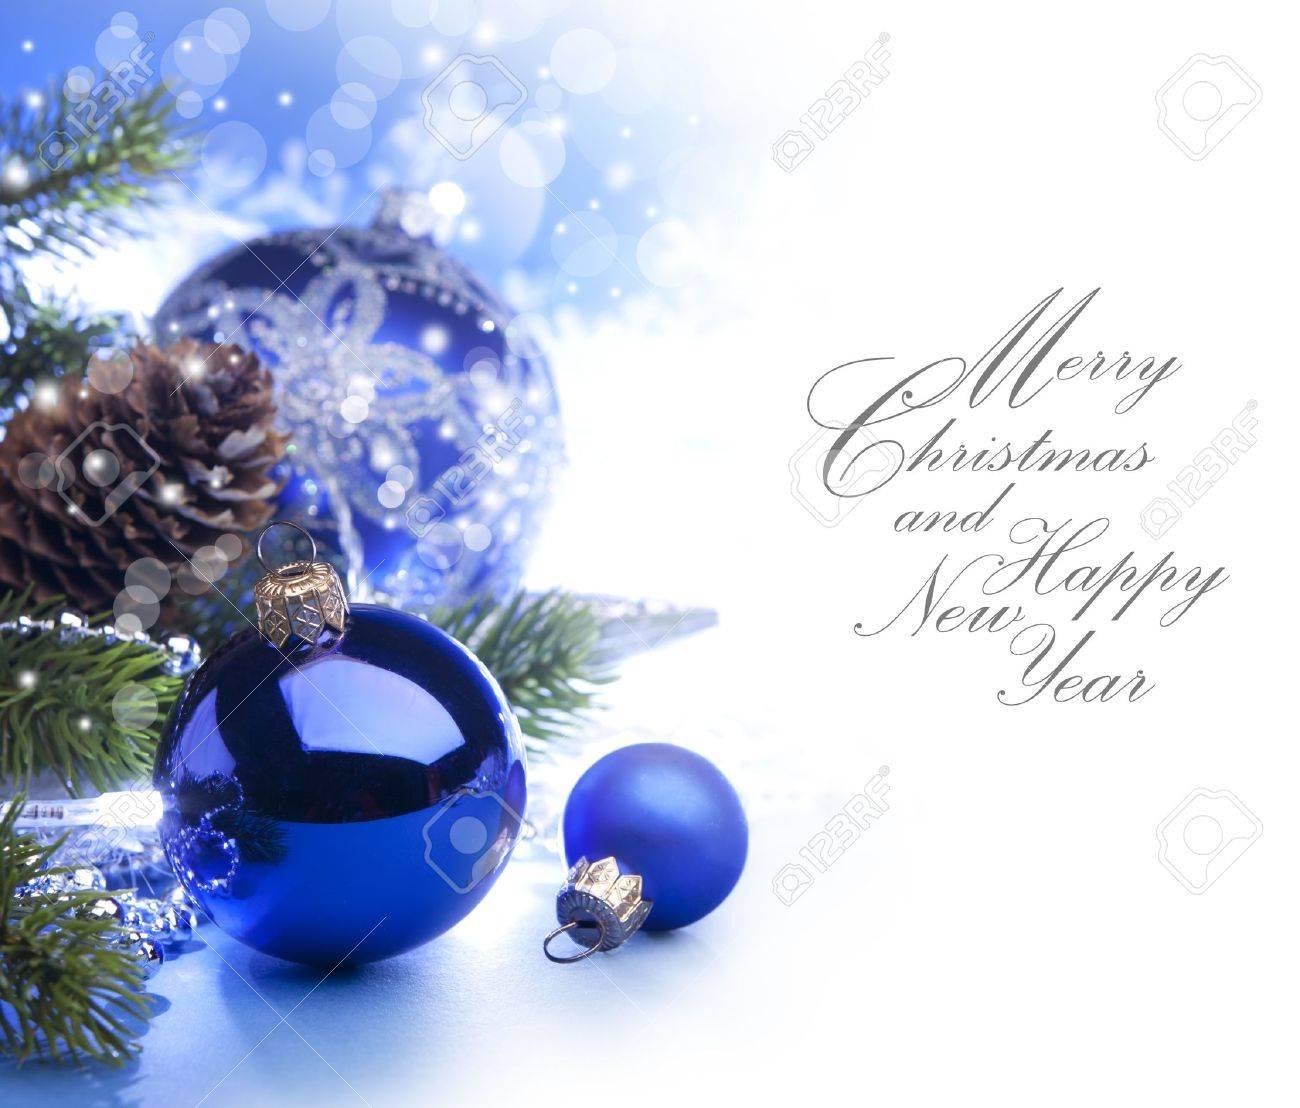 Art Christmas greeting card Stock Photo - 10460734